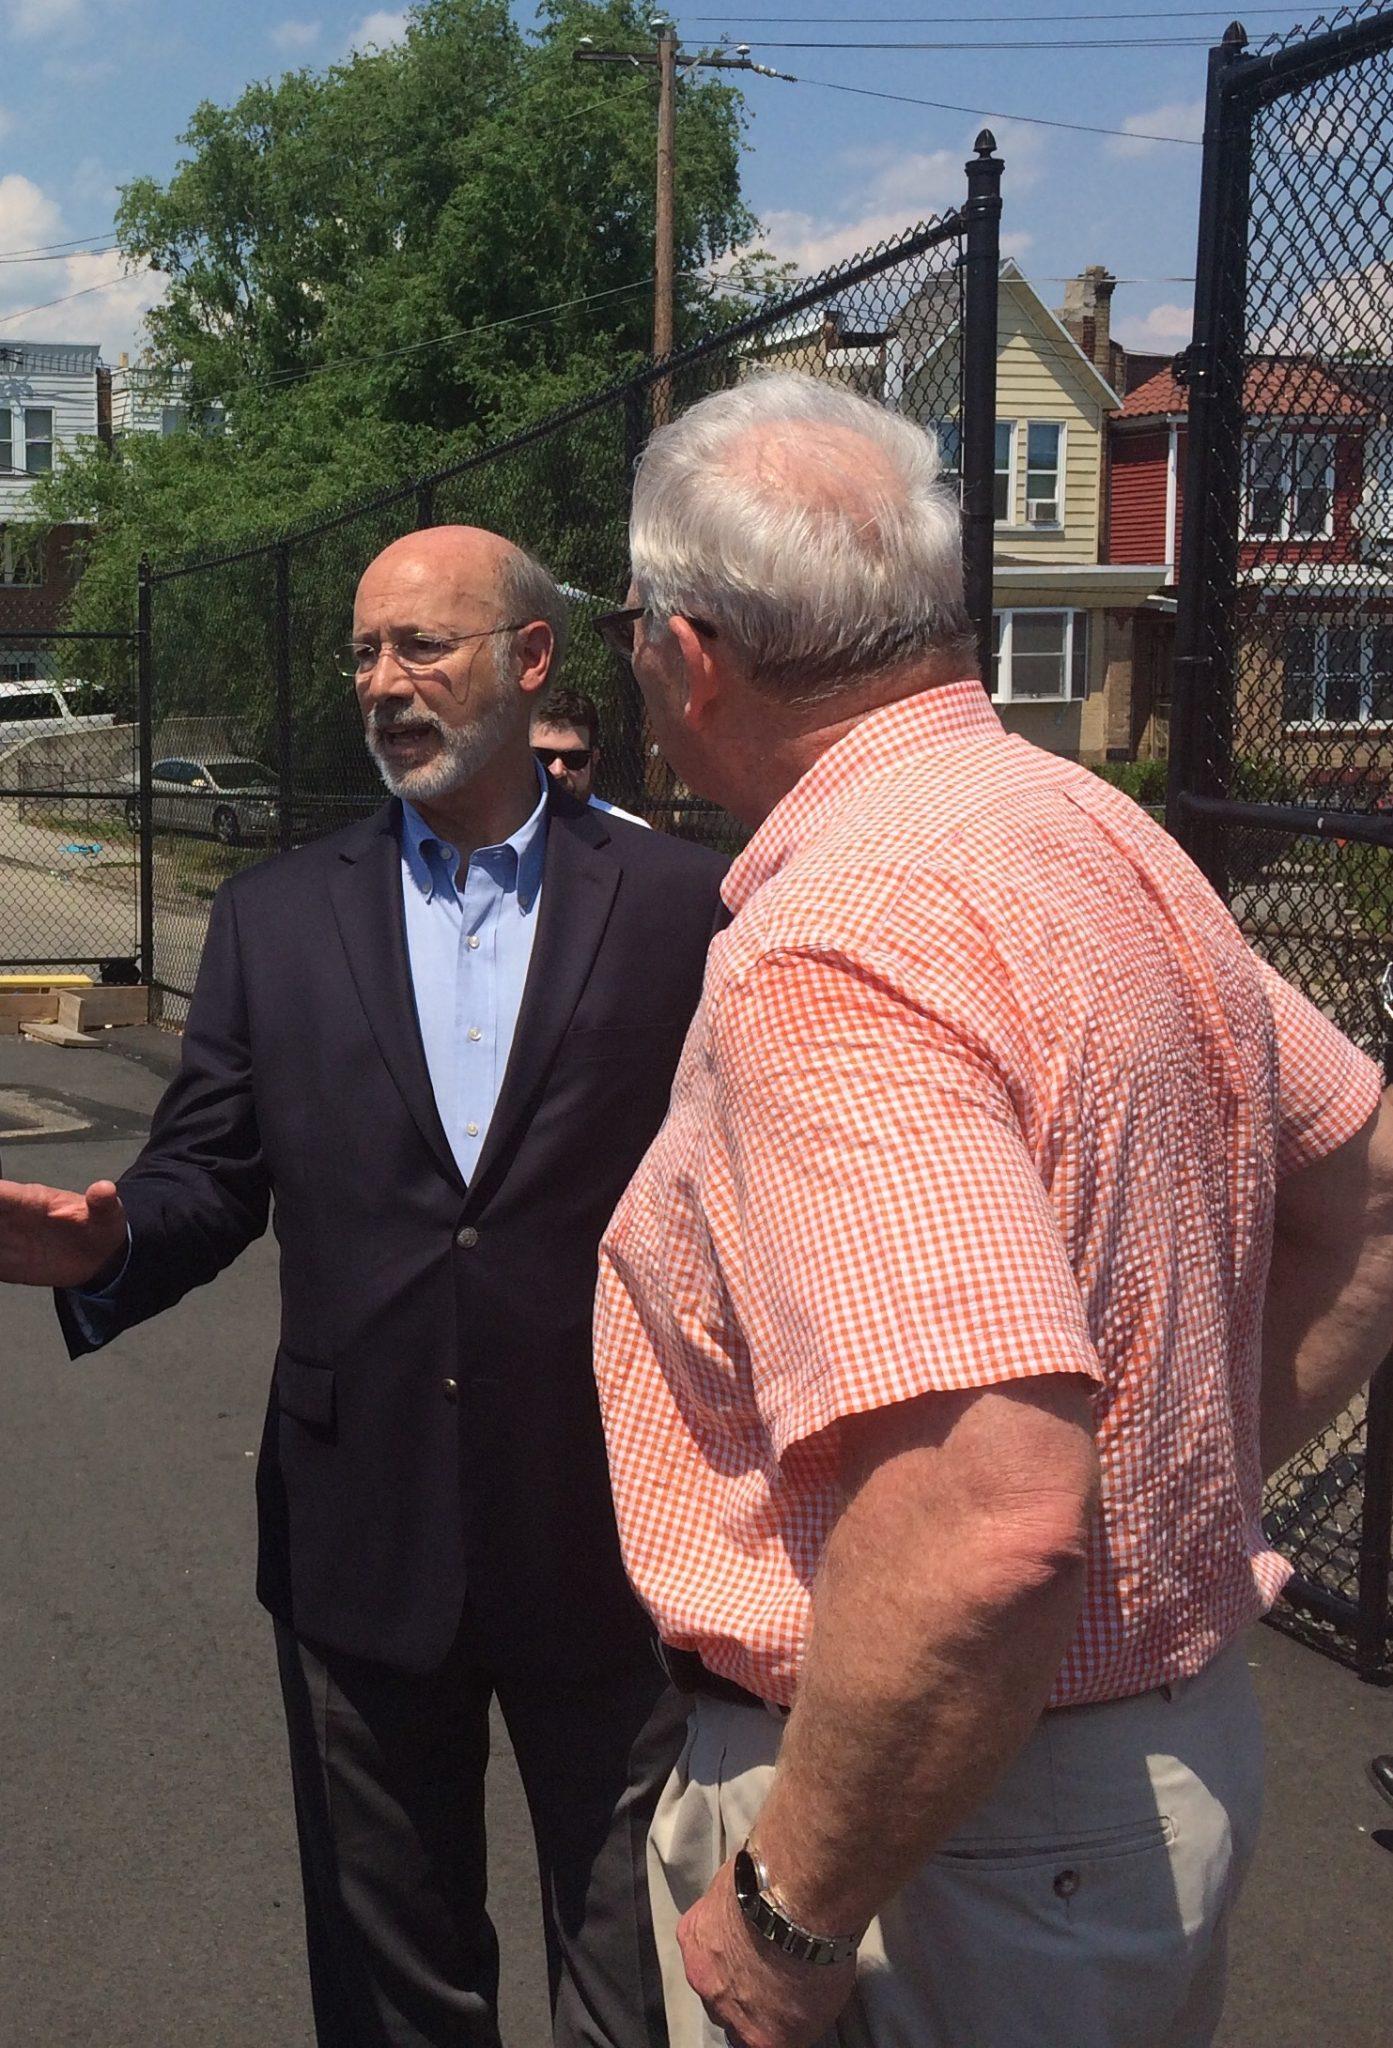 Photo Update – Governor Tom Wolf Visit